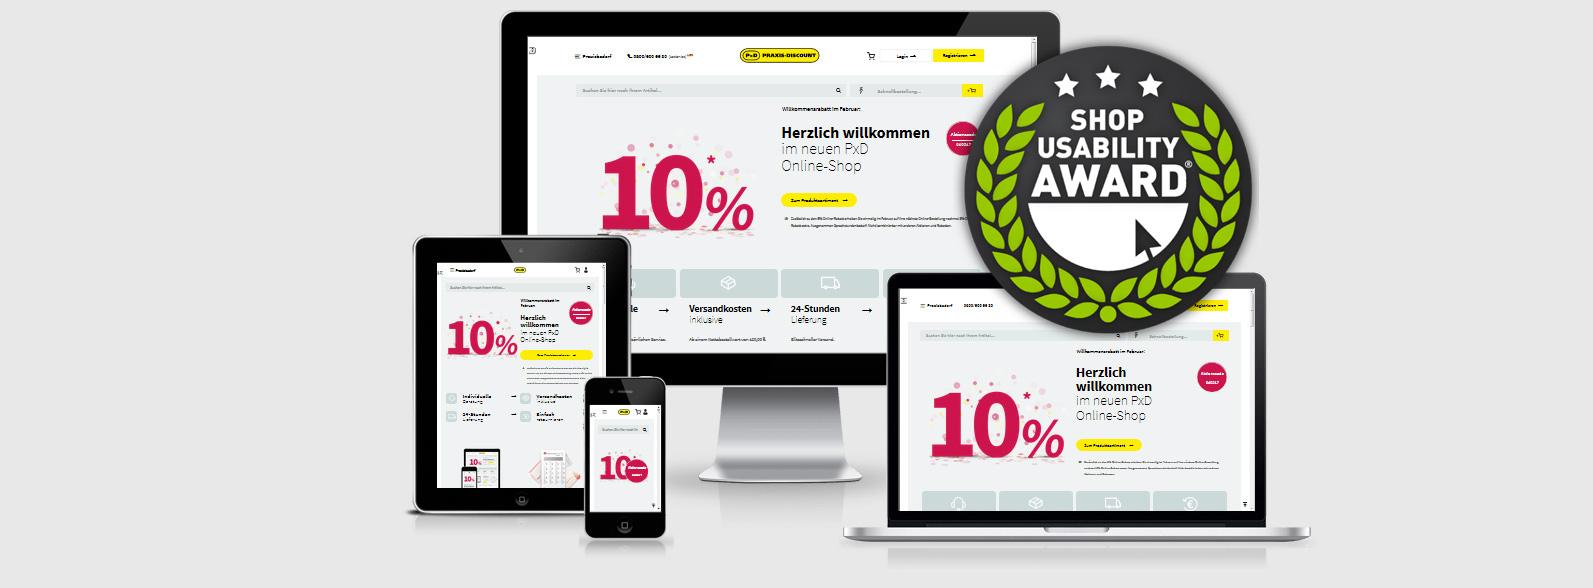 Praxis-Discount - Usability Award 2017